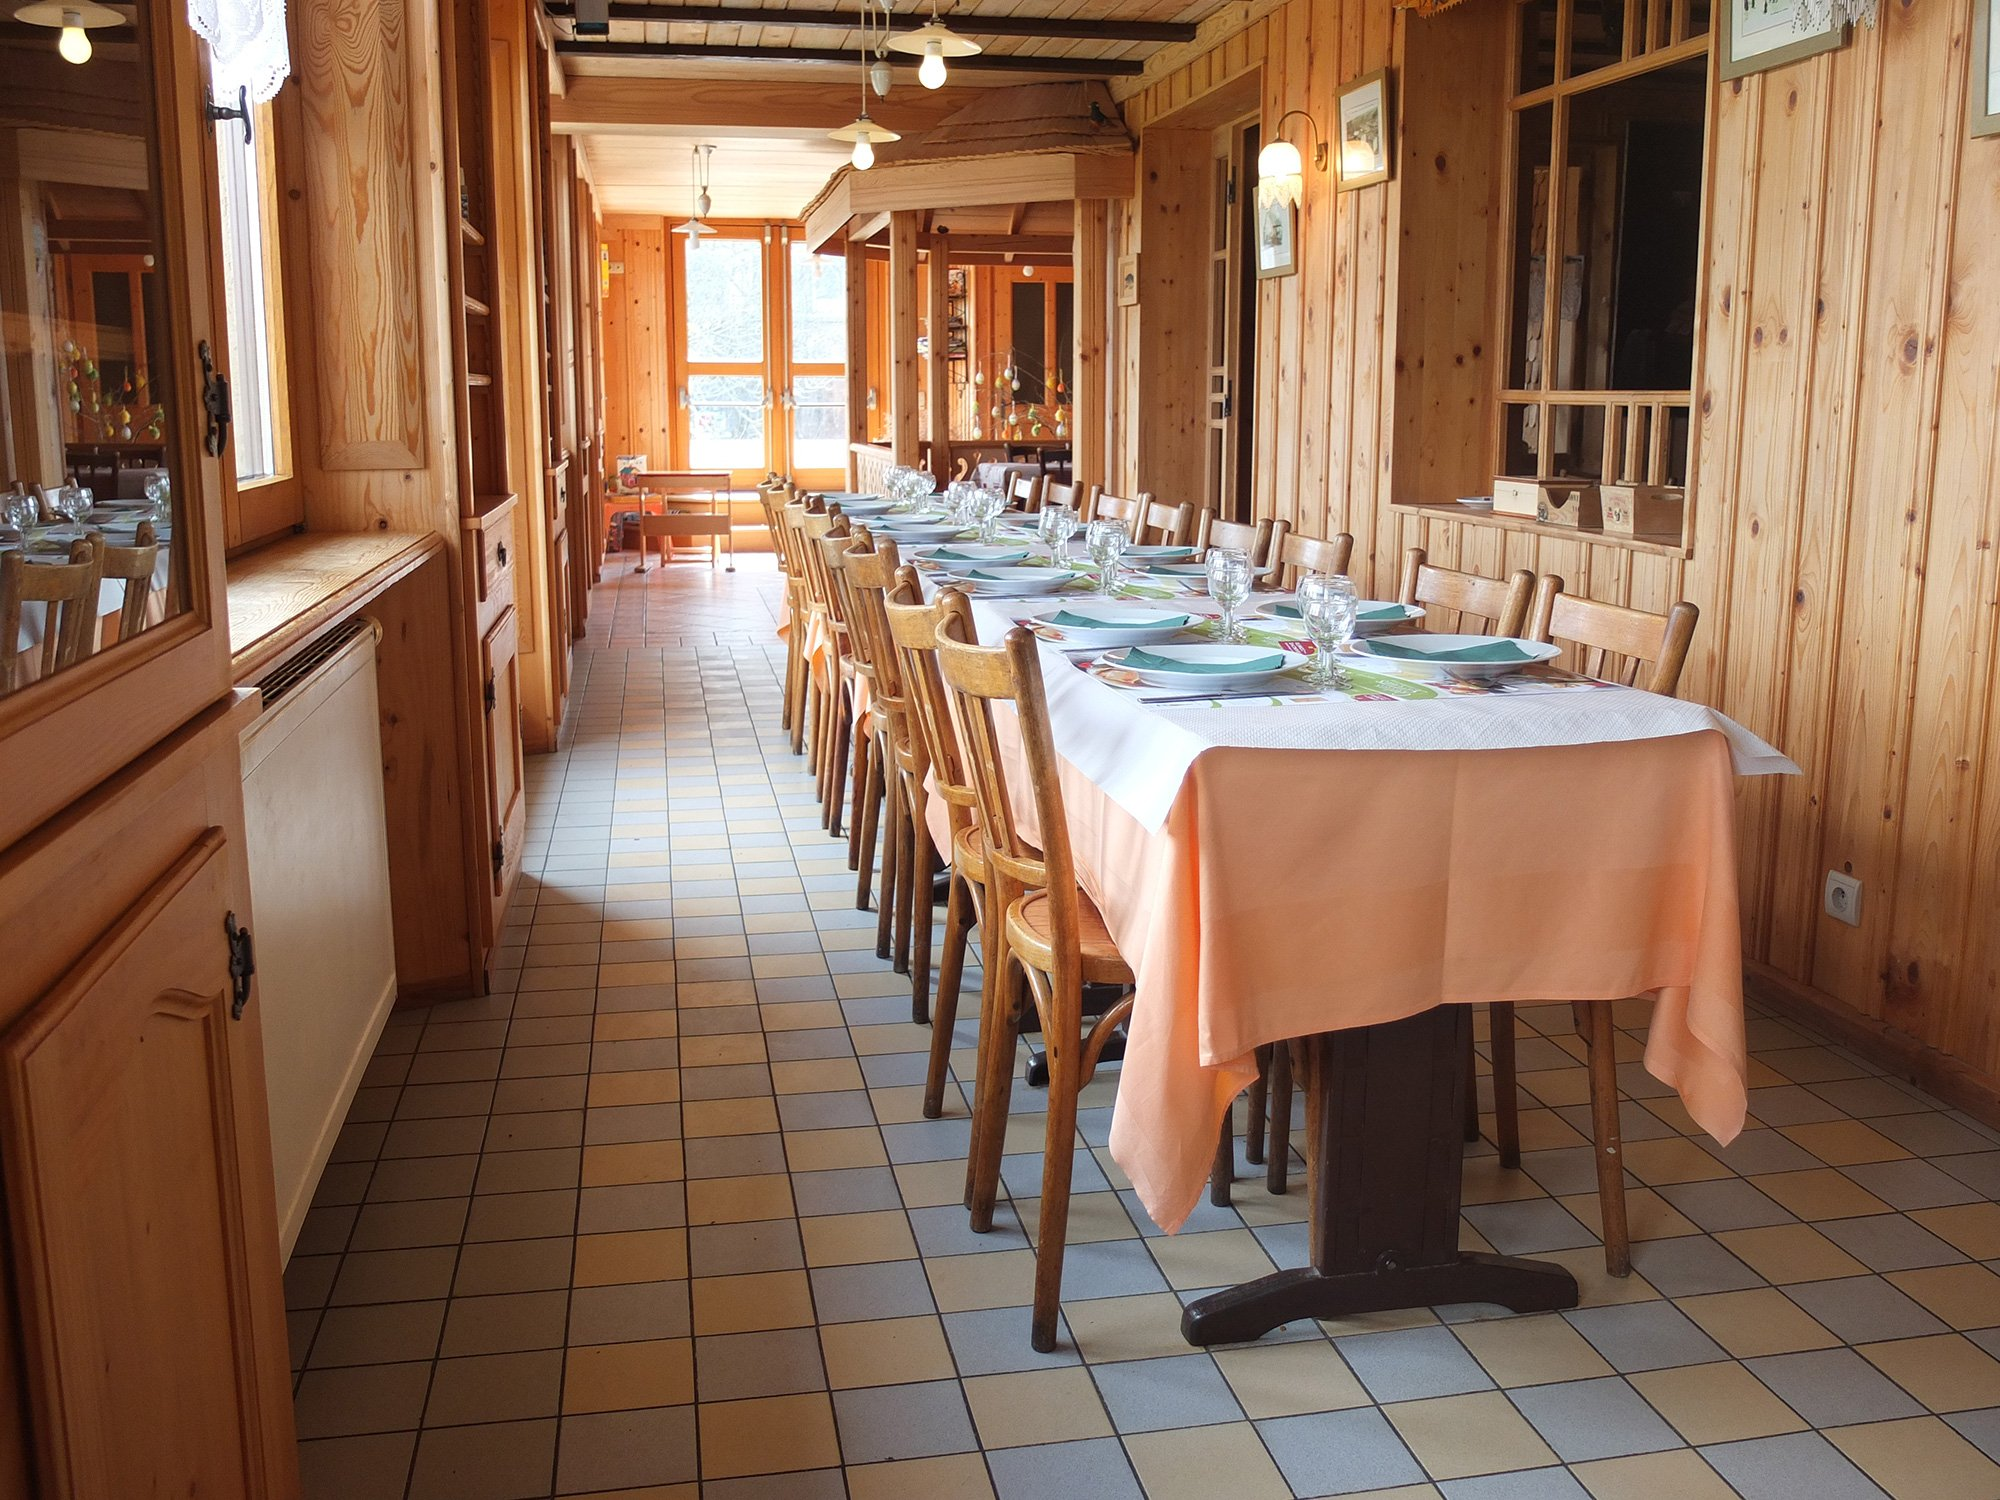 salle à manger auberge doubs